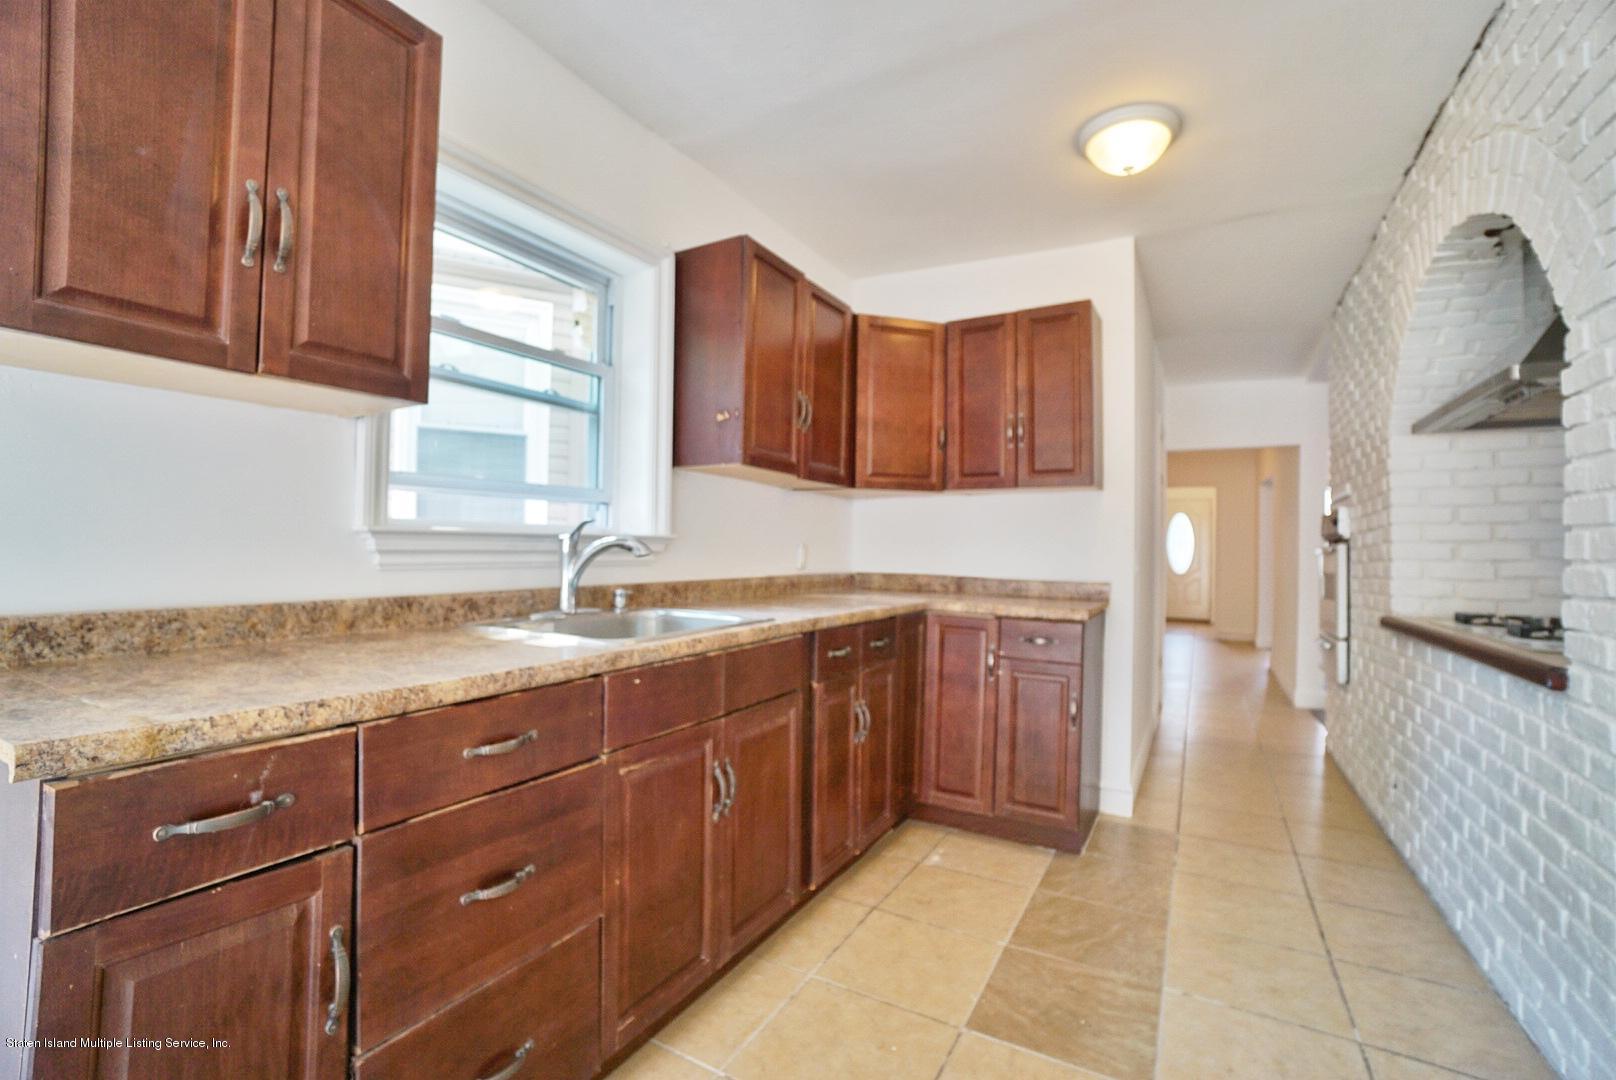 Single Family - Detached 53 Dubois Avenue  Staten Island, NY 10310, MLS-1128749-23